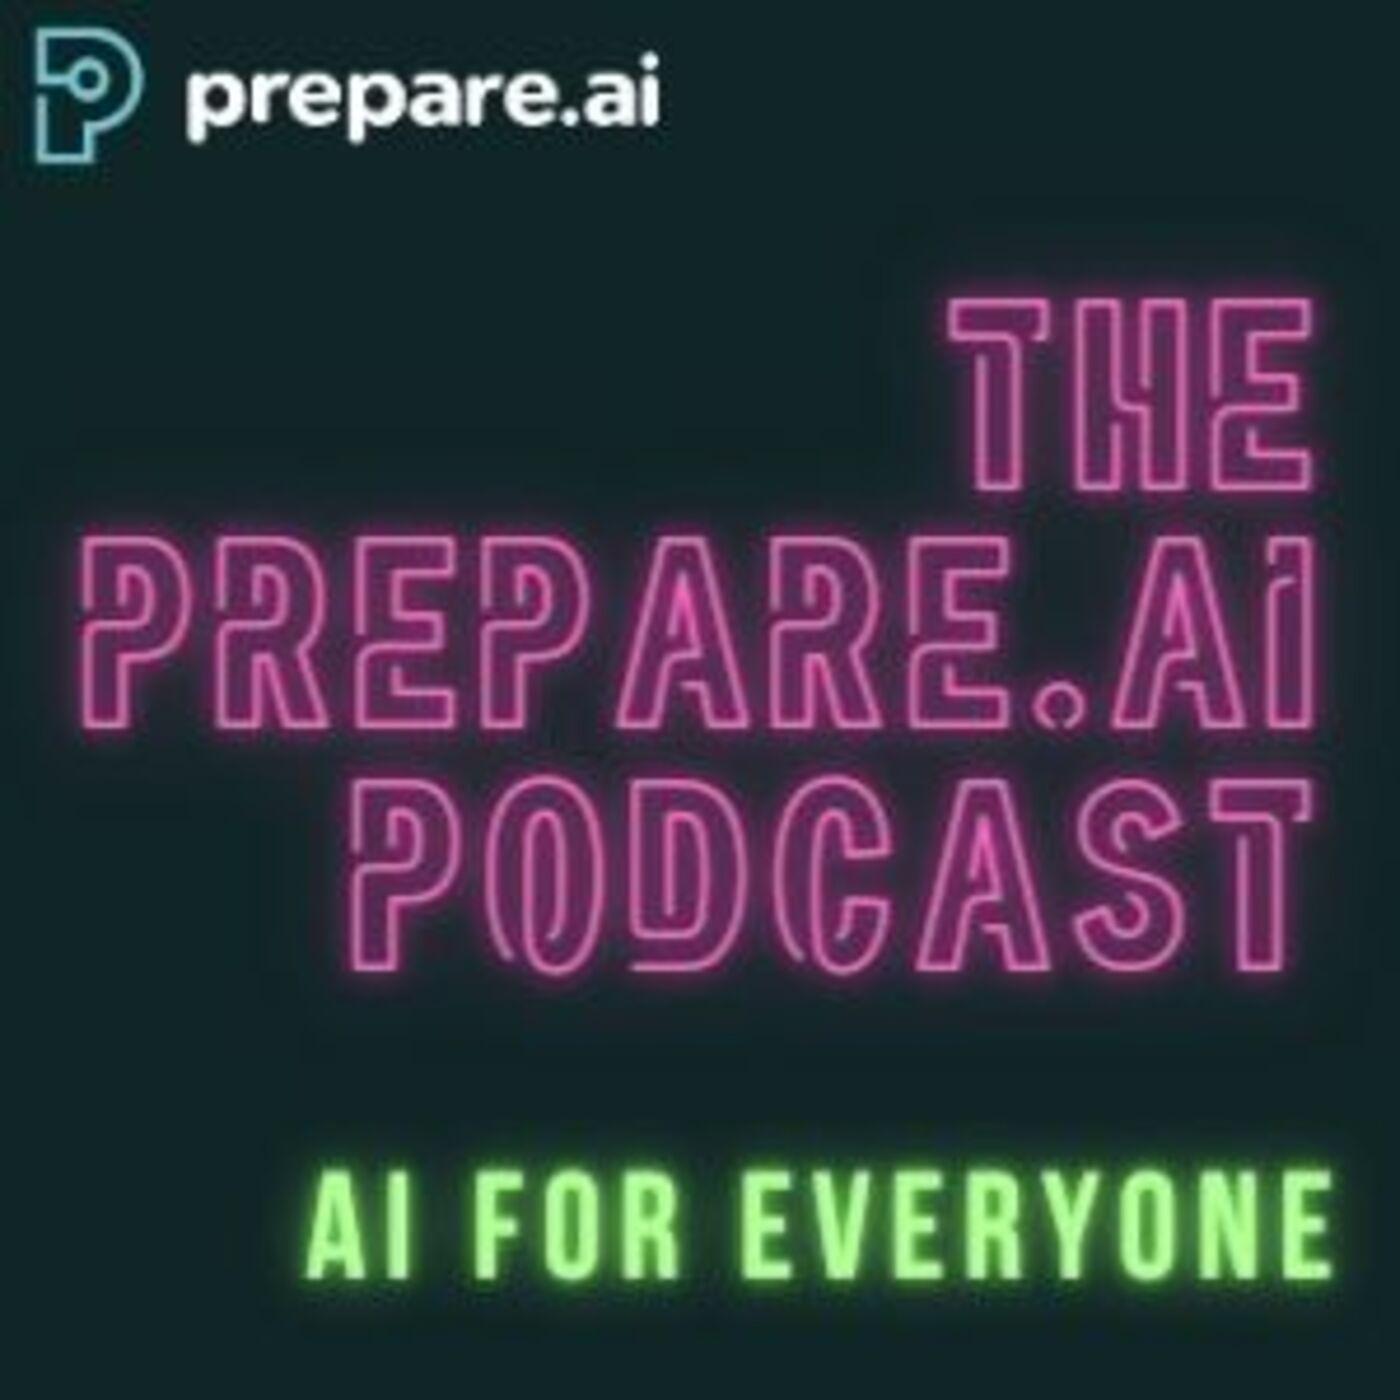 The Prepare.ai Podcast podcast show image